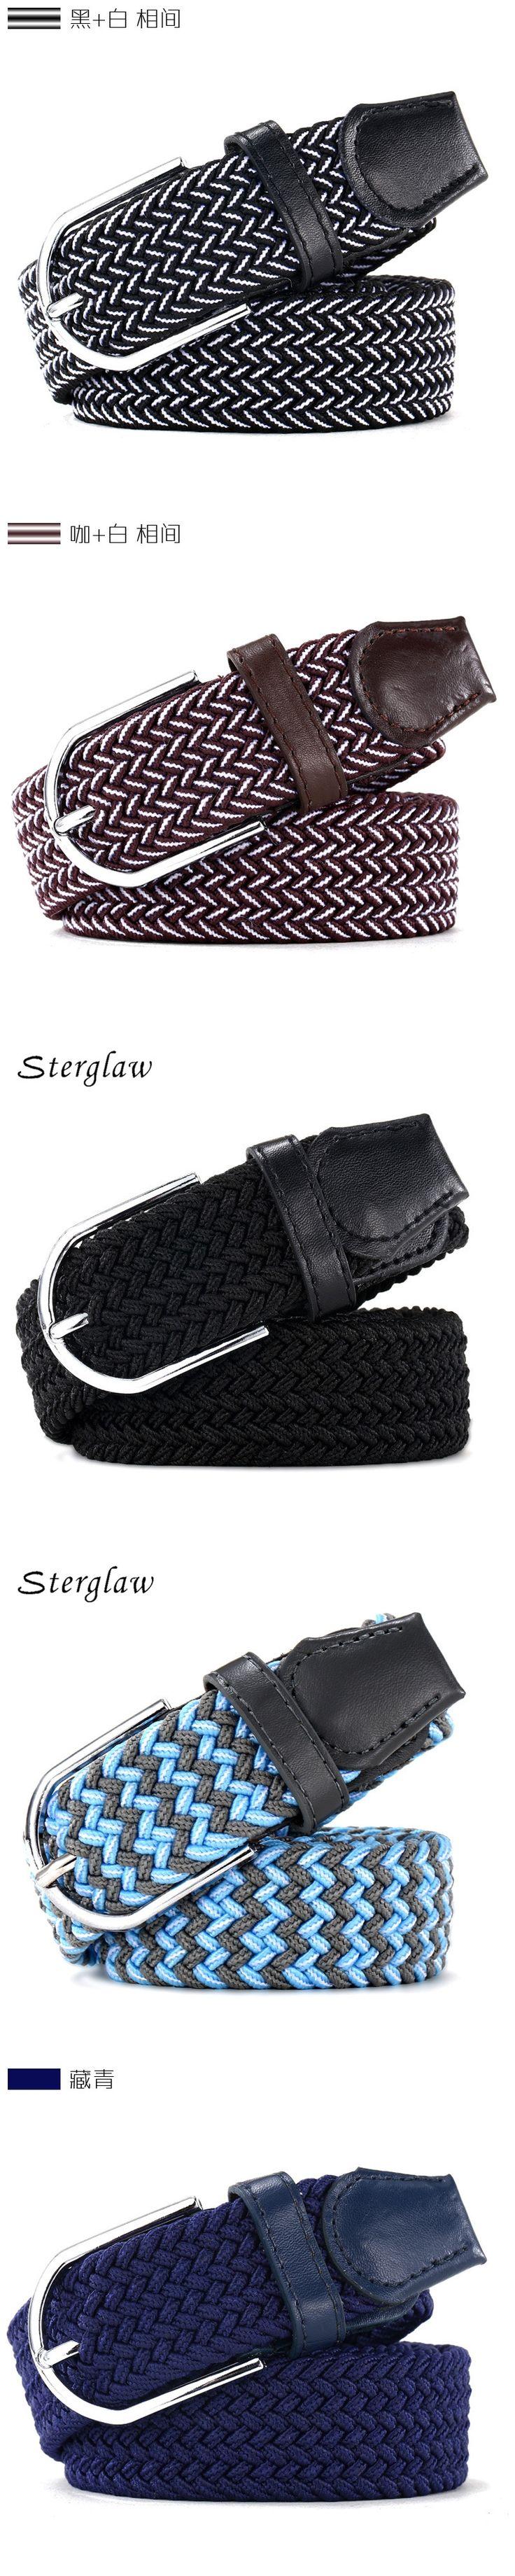 110cm Russia fashion Casual stretch woven belt Women's unisex Canvas elastic belts for women jeans elastique Modeling belt  F142